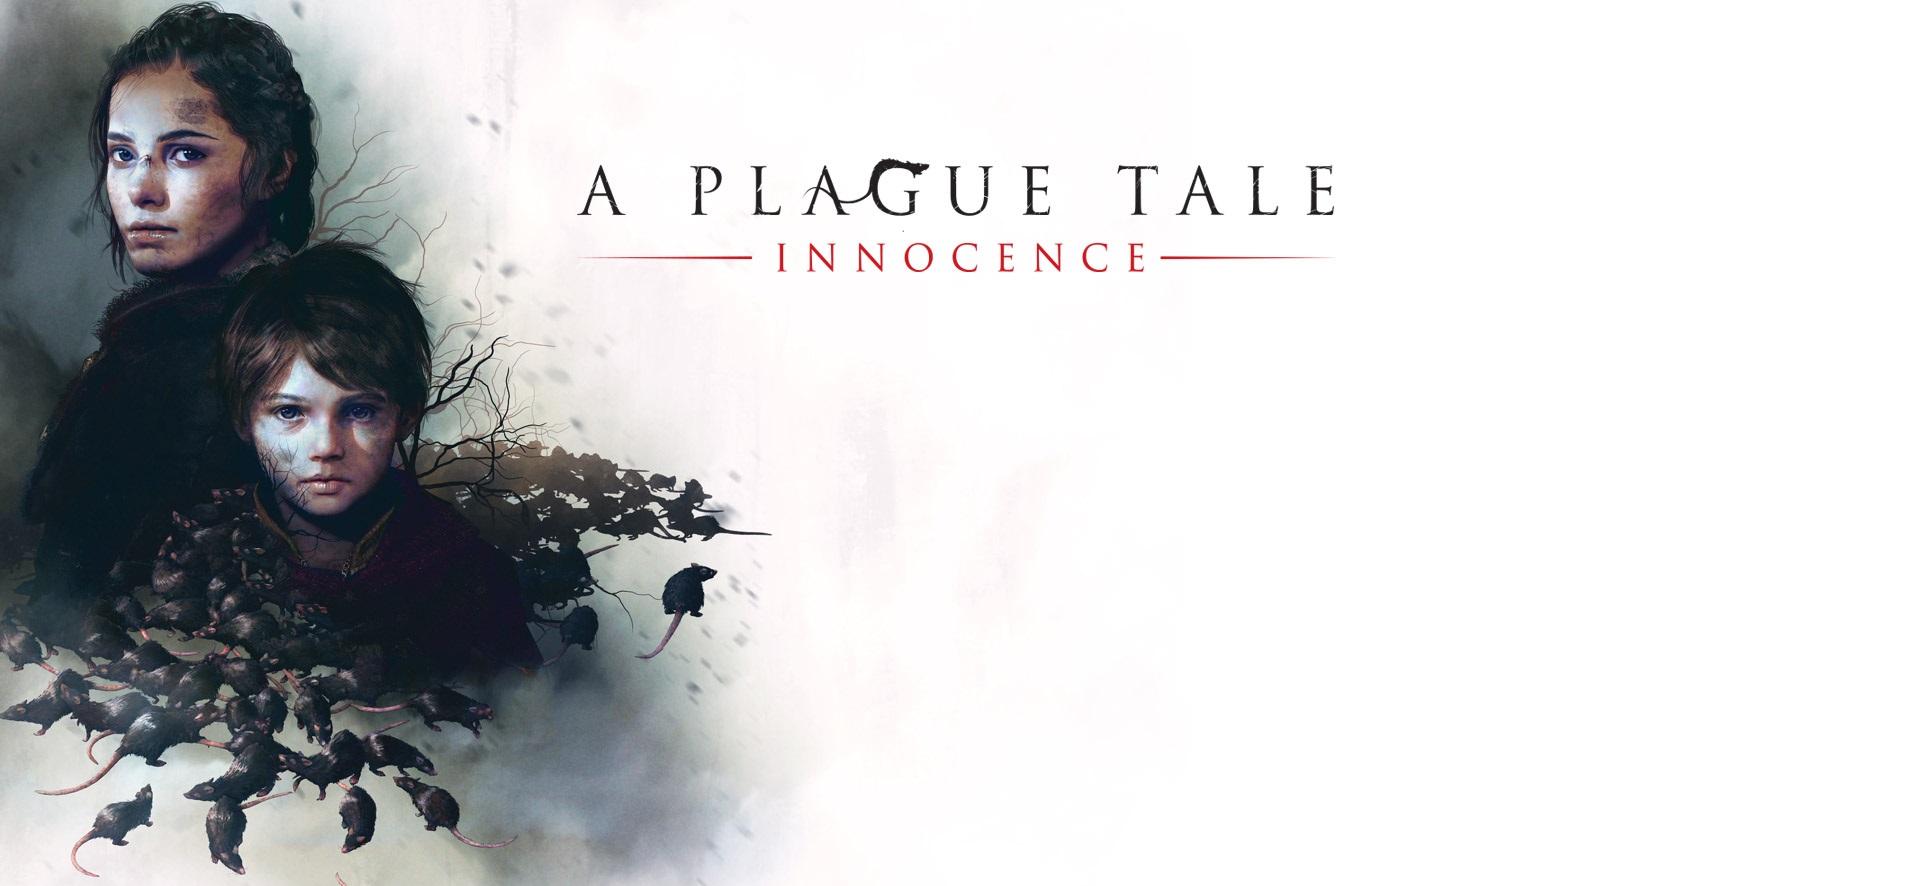 152203-APlagueTale-Innocence_bg2.jpg